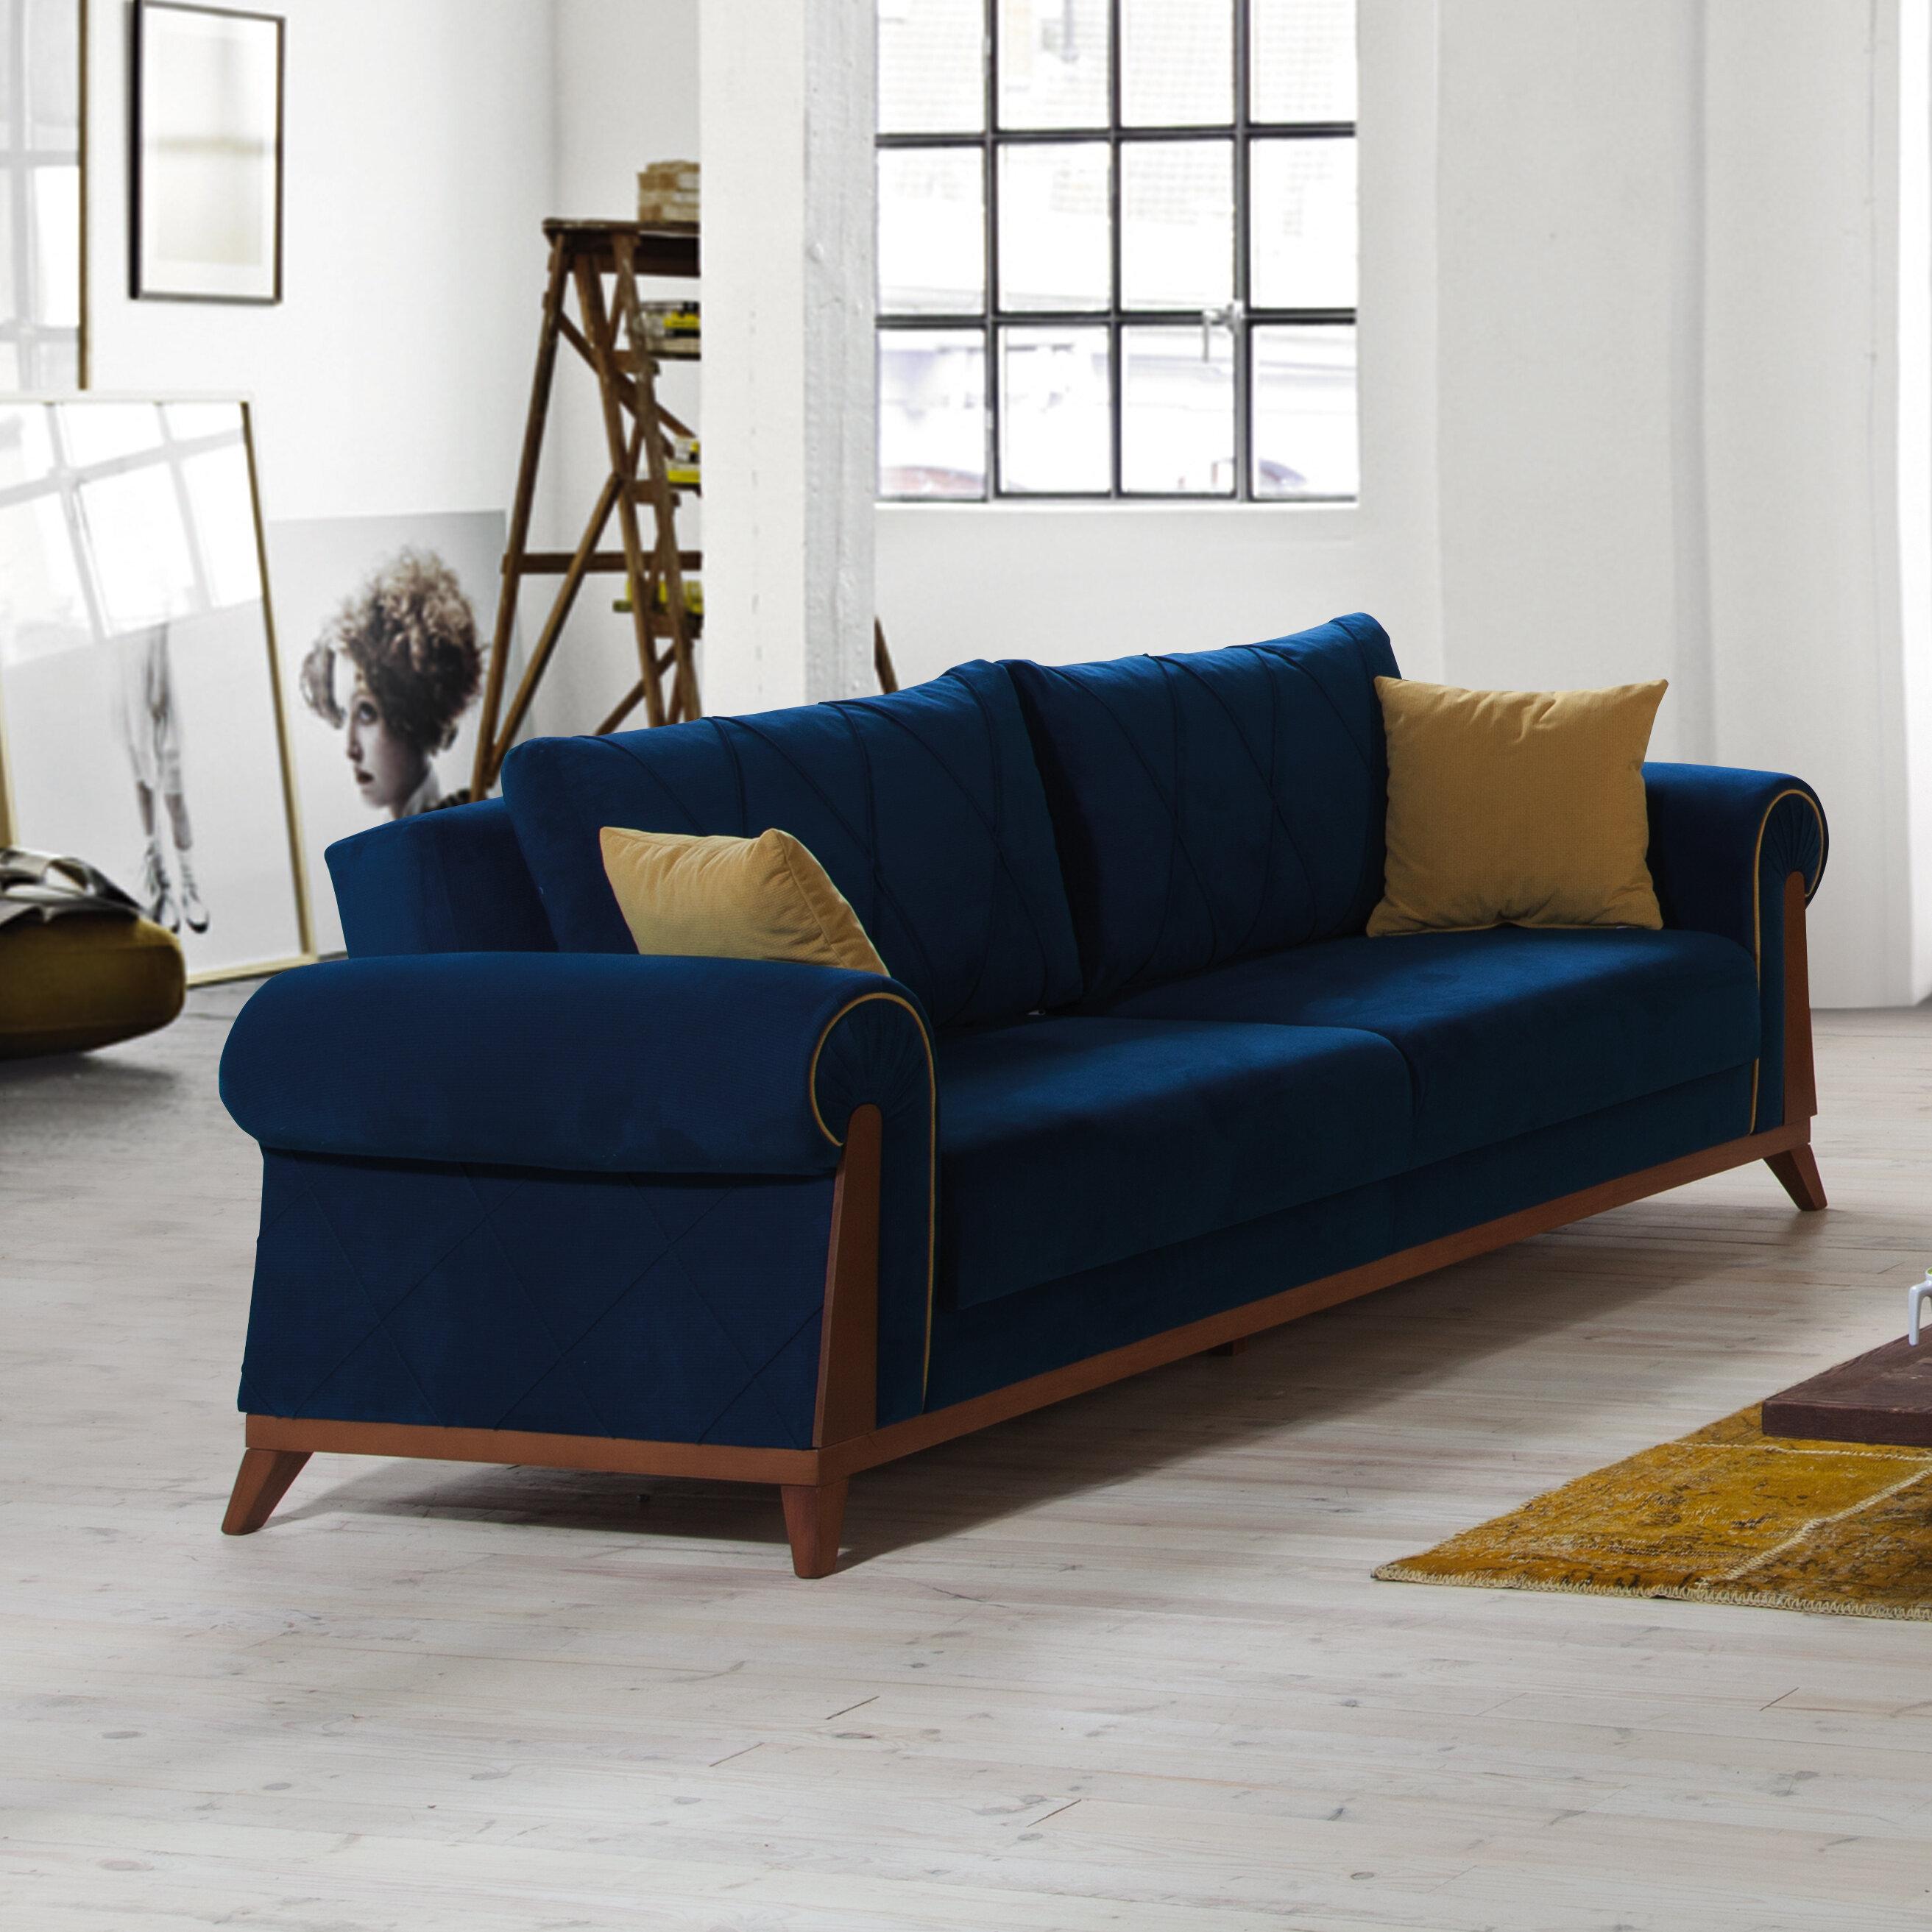 Corrigan Studio Lambert Sleeper Sofa Reviews Wayfair